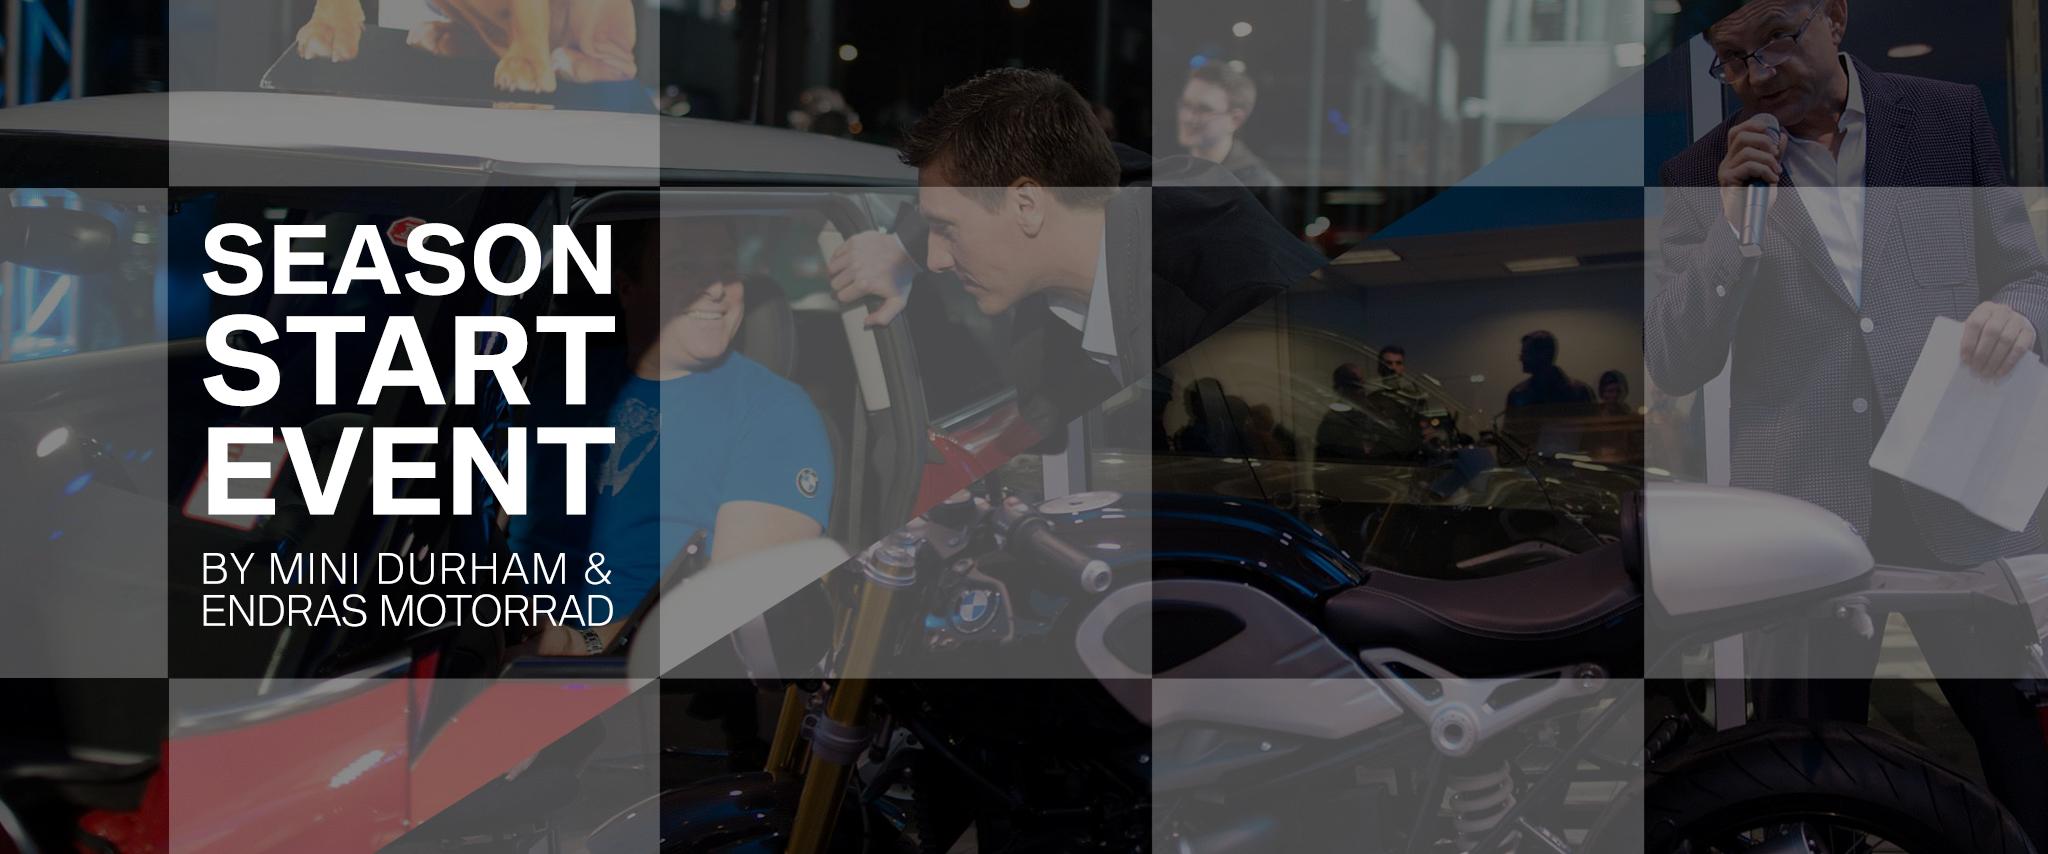 Season Start Event hosted by MINI Durham & Endras Motorrad